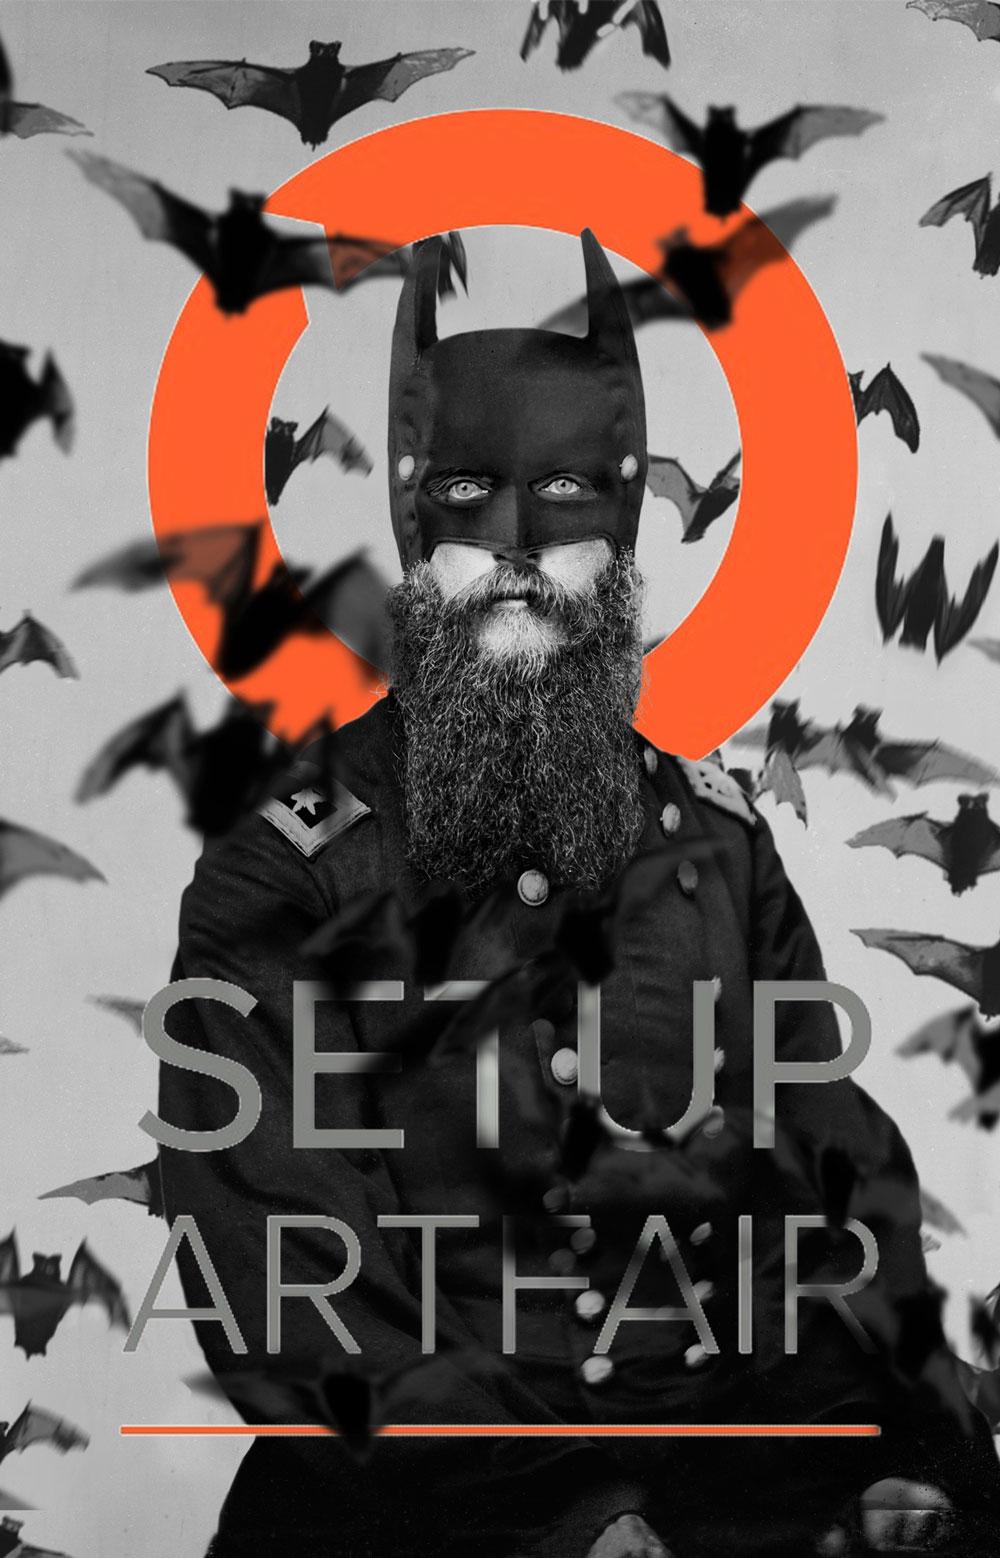 SETUP art fair 2016